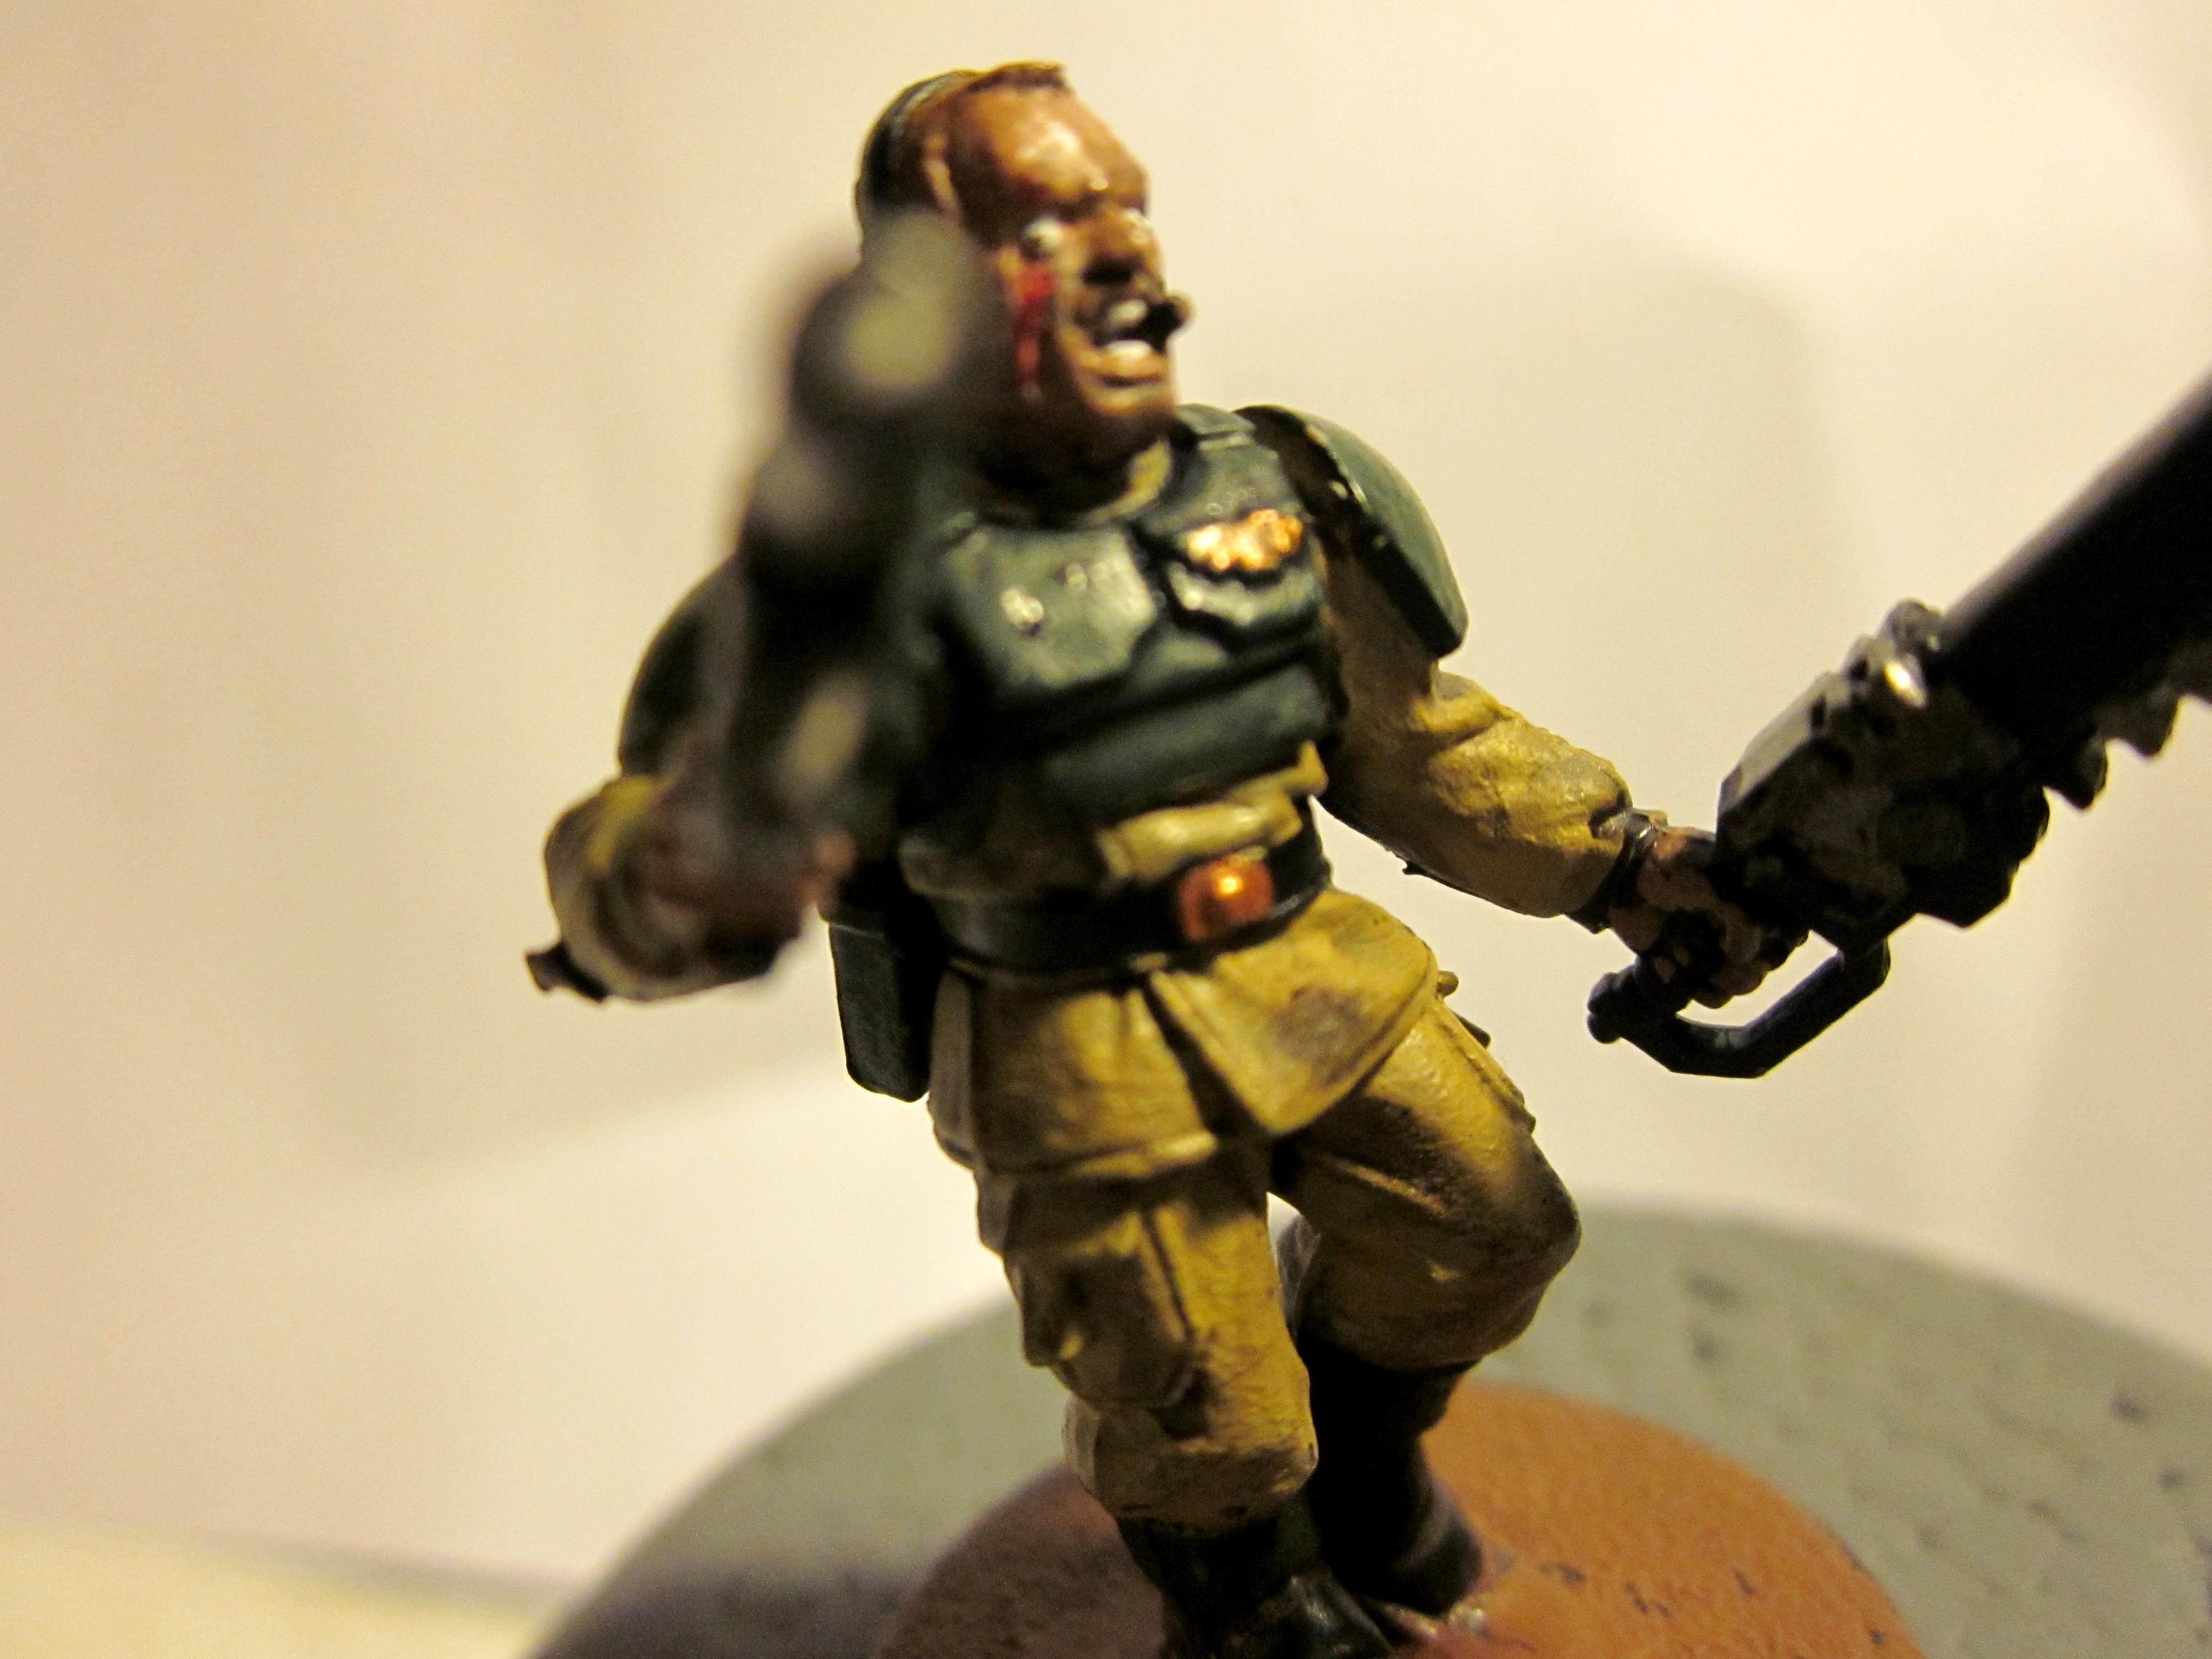 Chain Sword, Imperial Guard, Scar, Sergeant